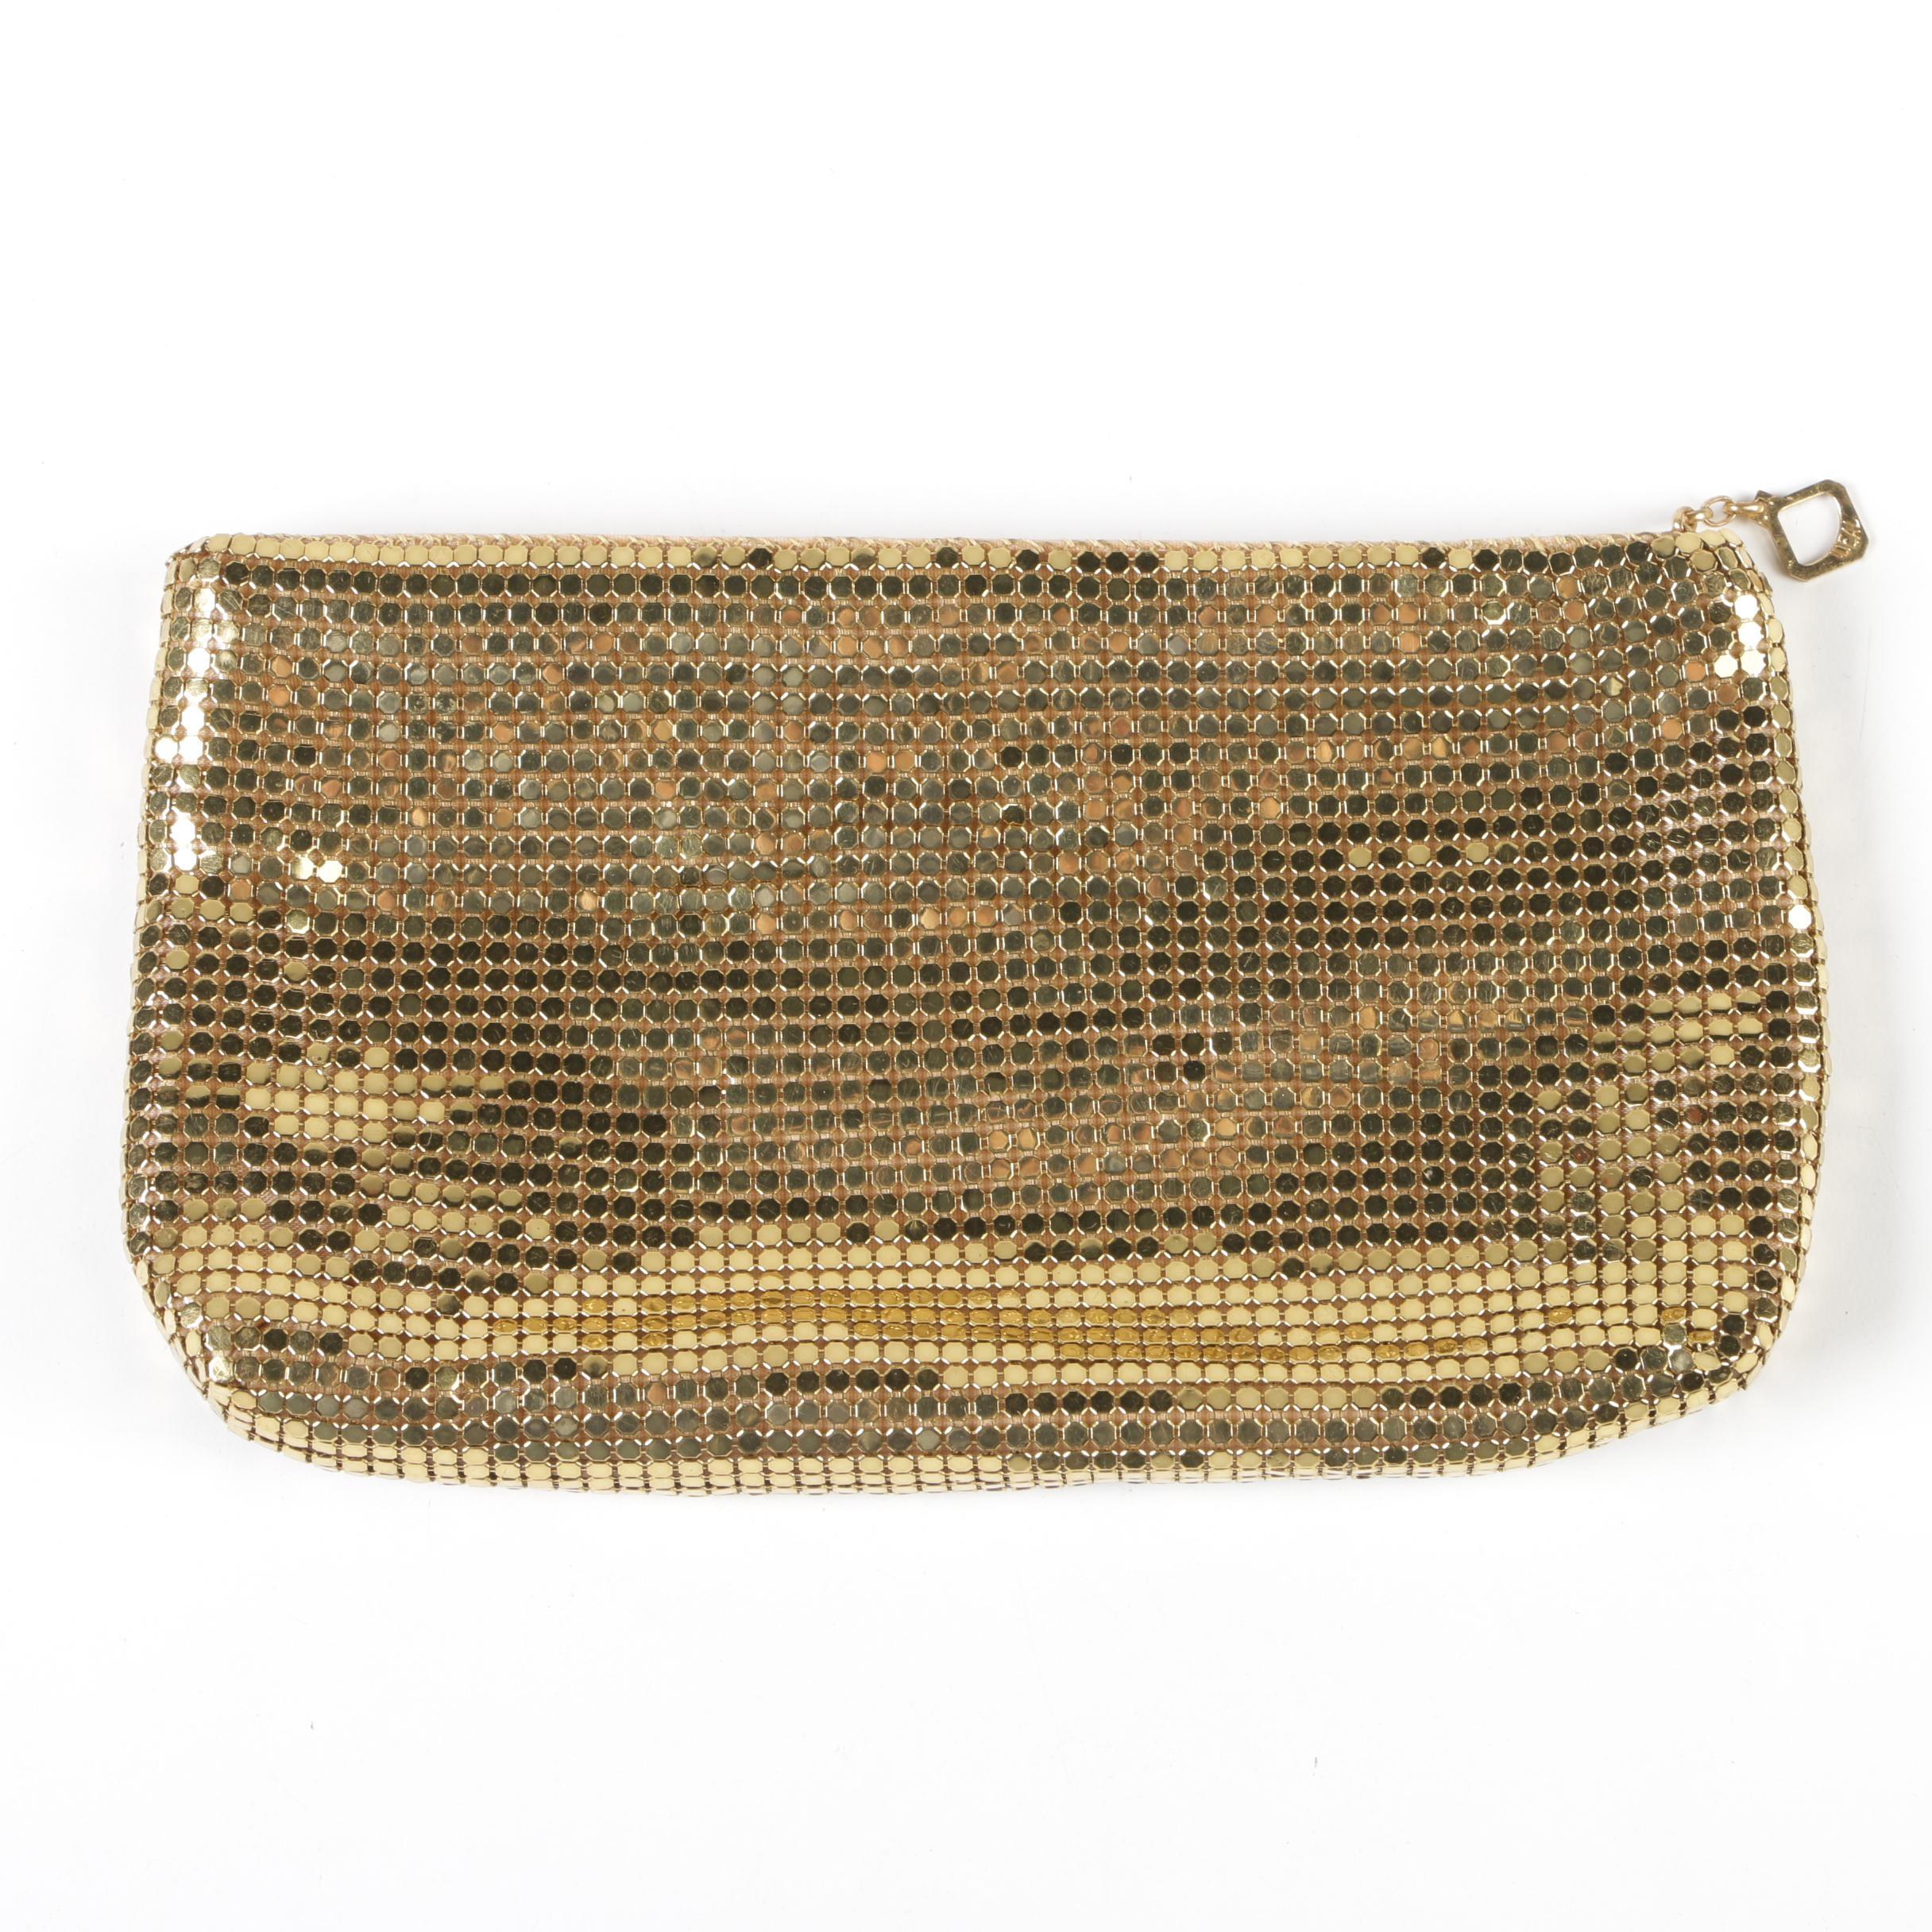 Duramesh Fifth Avenue Gold Mesh Clutch with IDEAL Zipper, Mid-20th Century